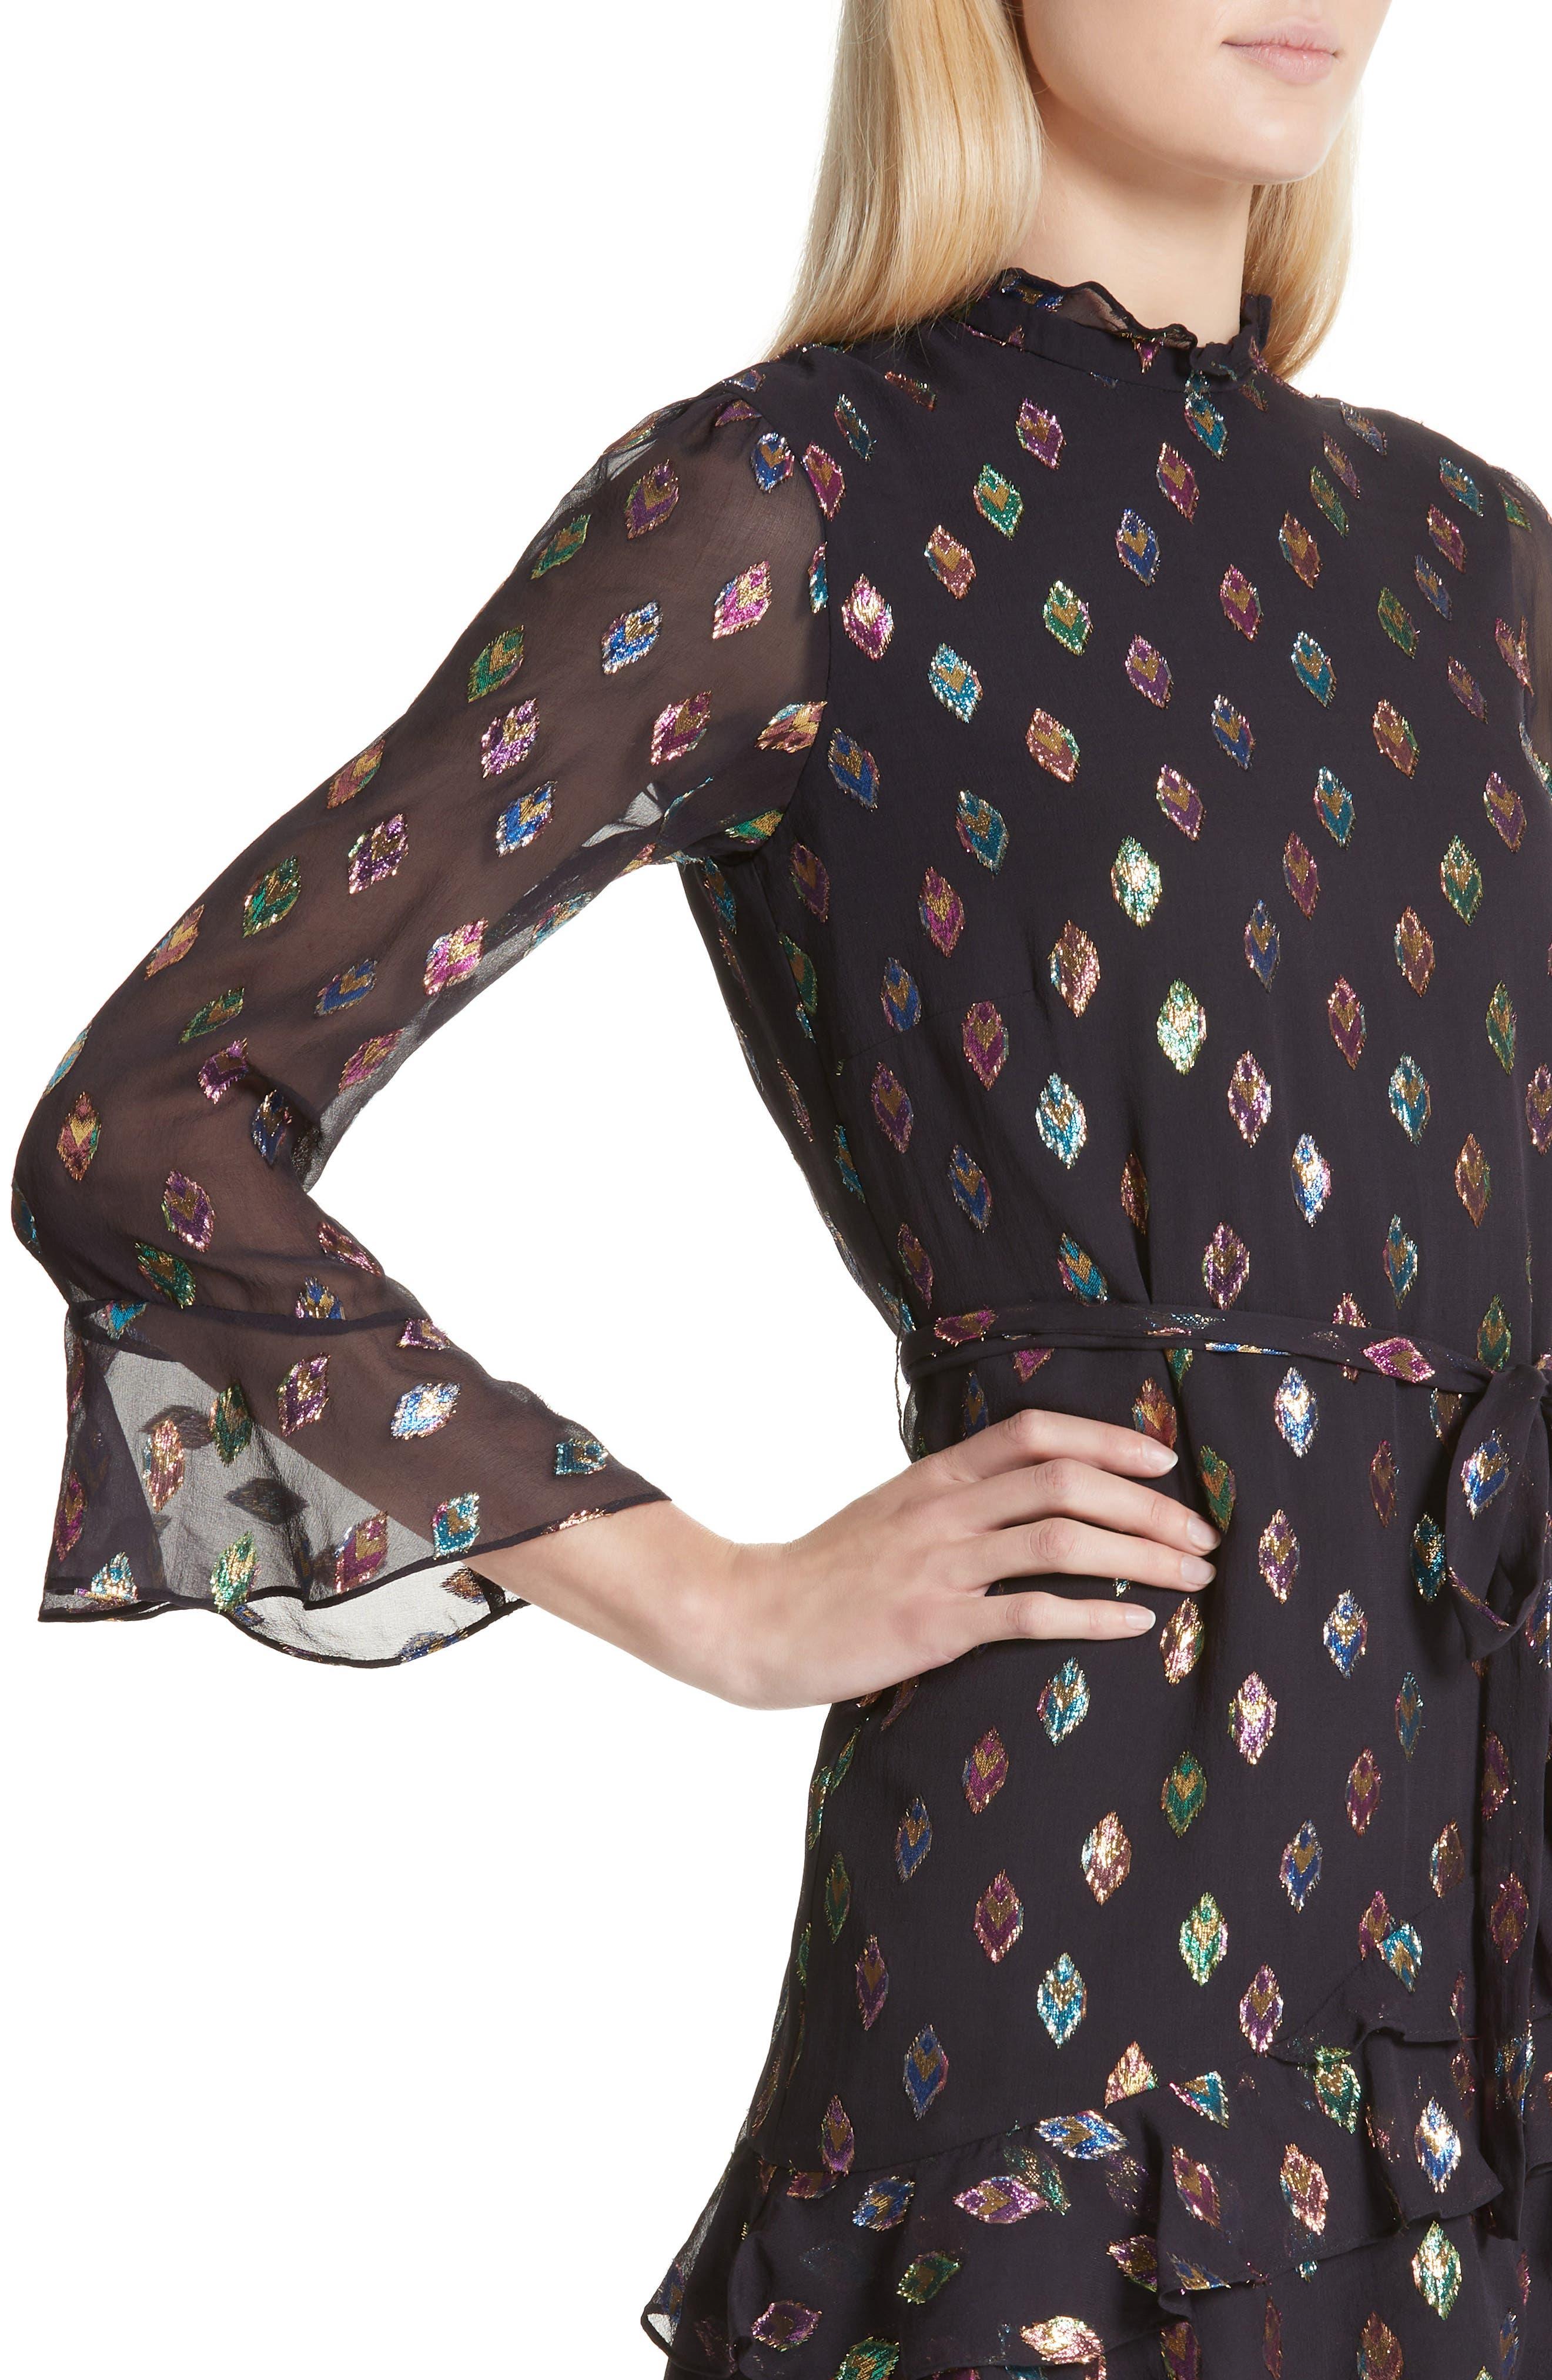 SALONI, Marissa Metallic Fil Coupé Silk Blend Minidress, Alternate thumbnail 4, color, 003